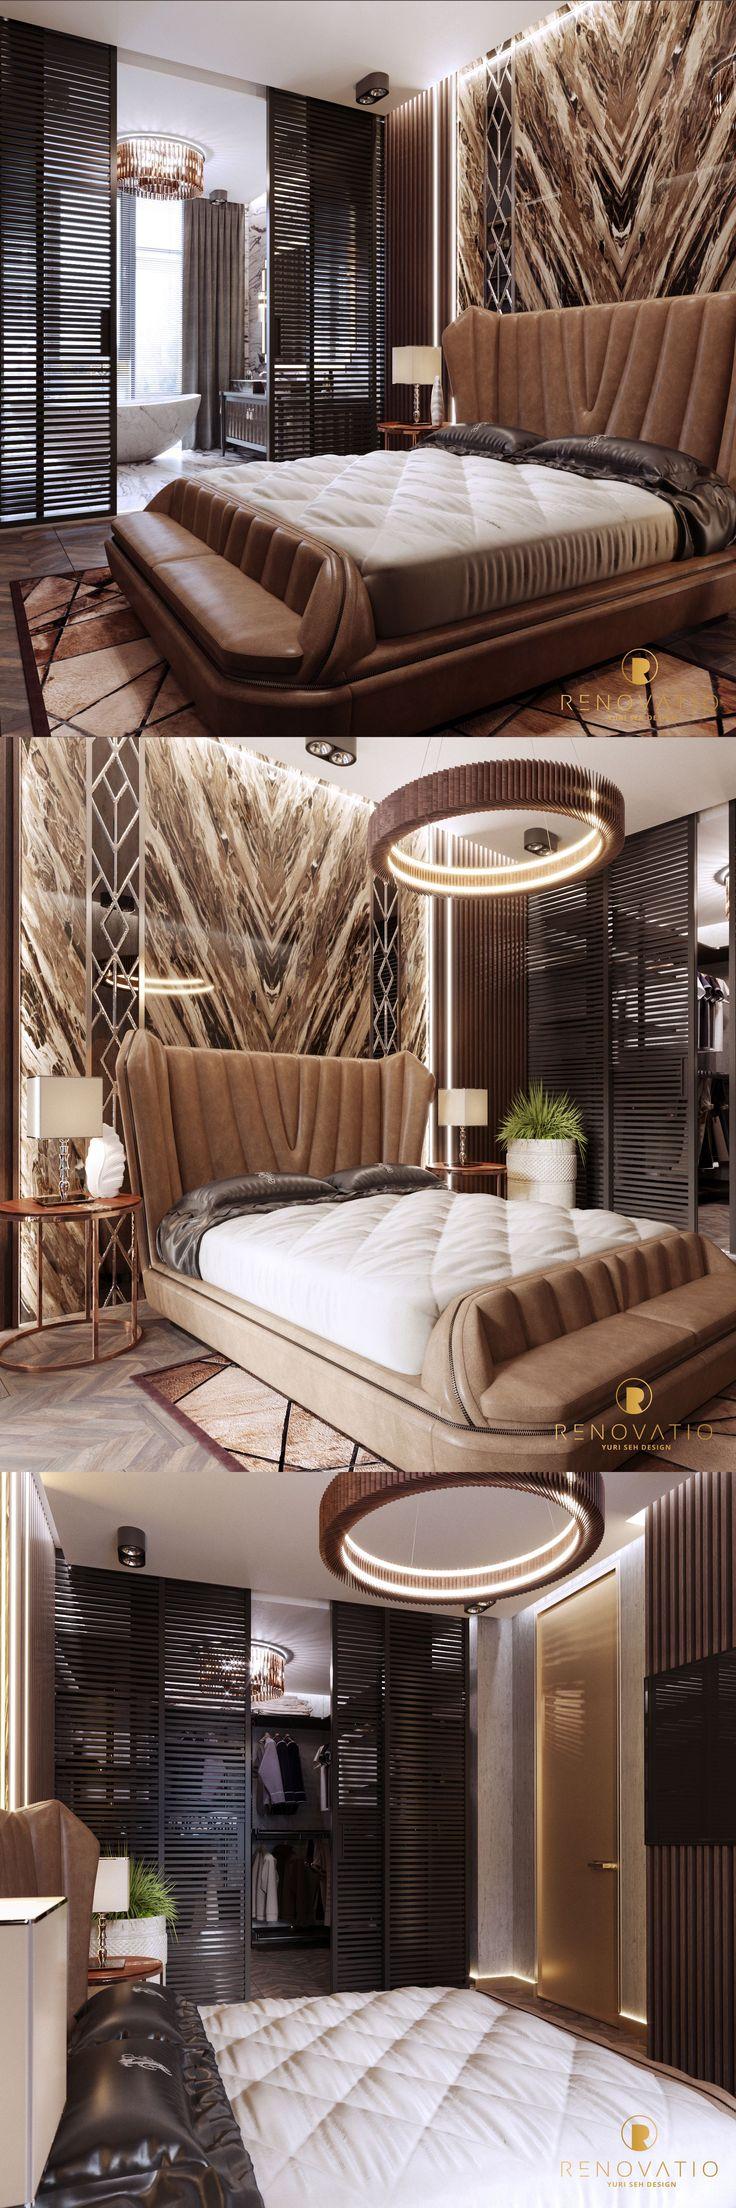 1351 best Chambre luxe images on Pinterest | Bedroom ideas, Bedroom ...